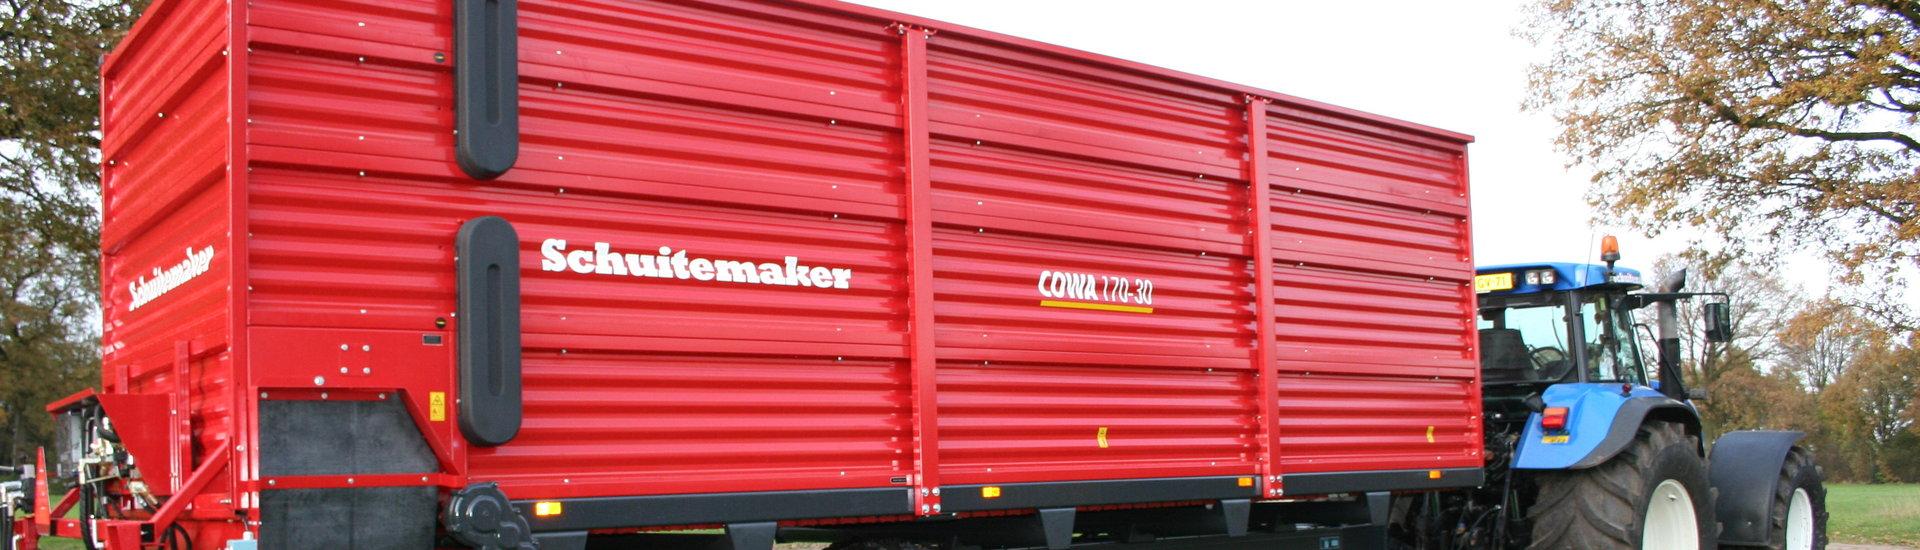 Schuitemaker Cowa Kompostwagen